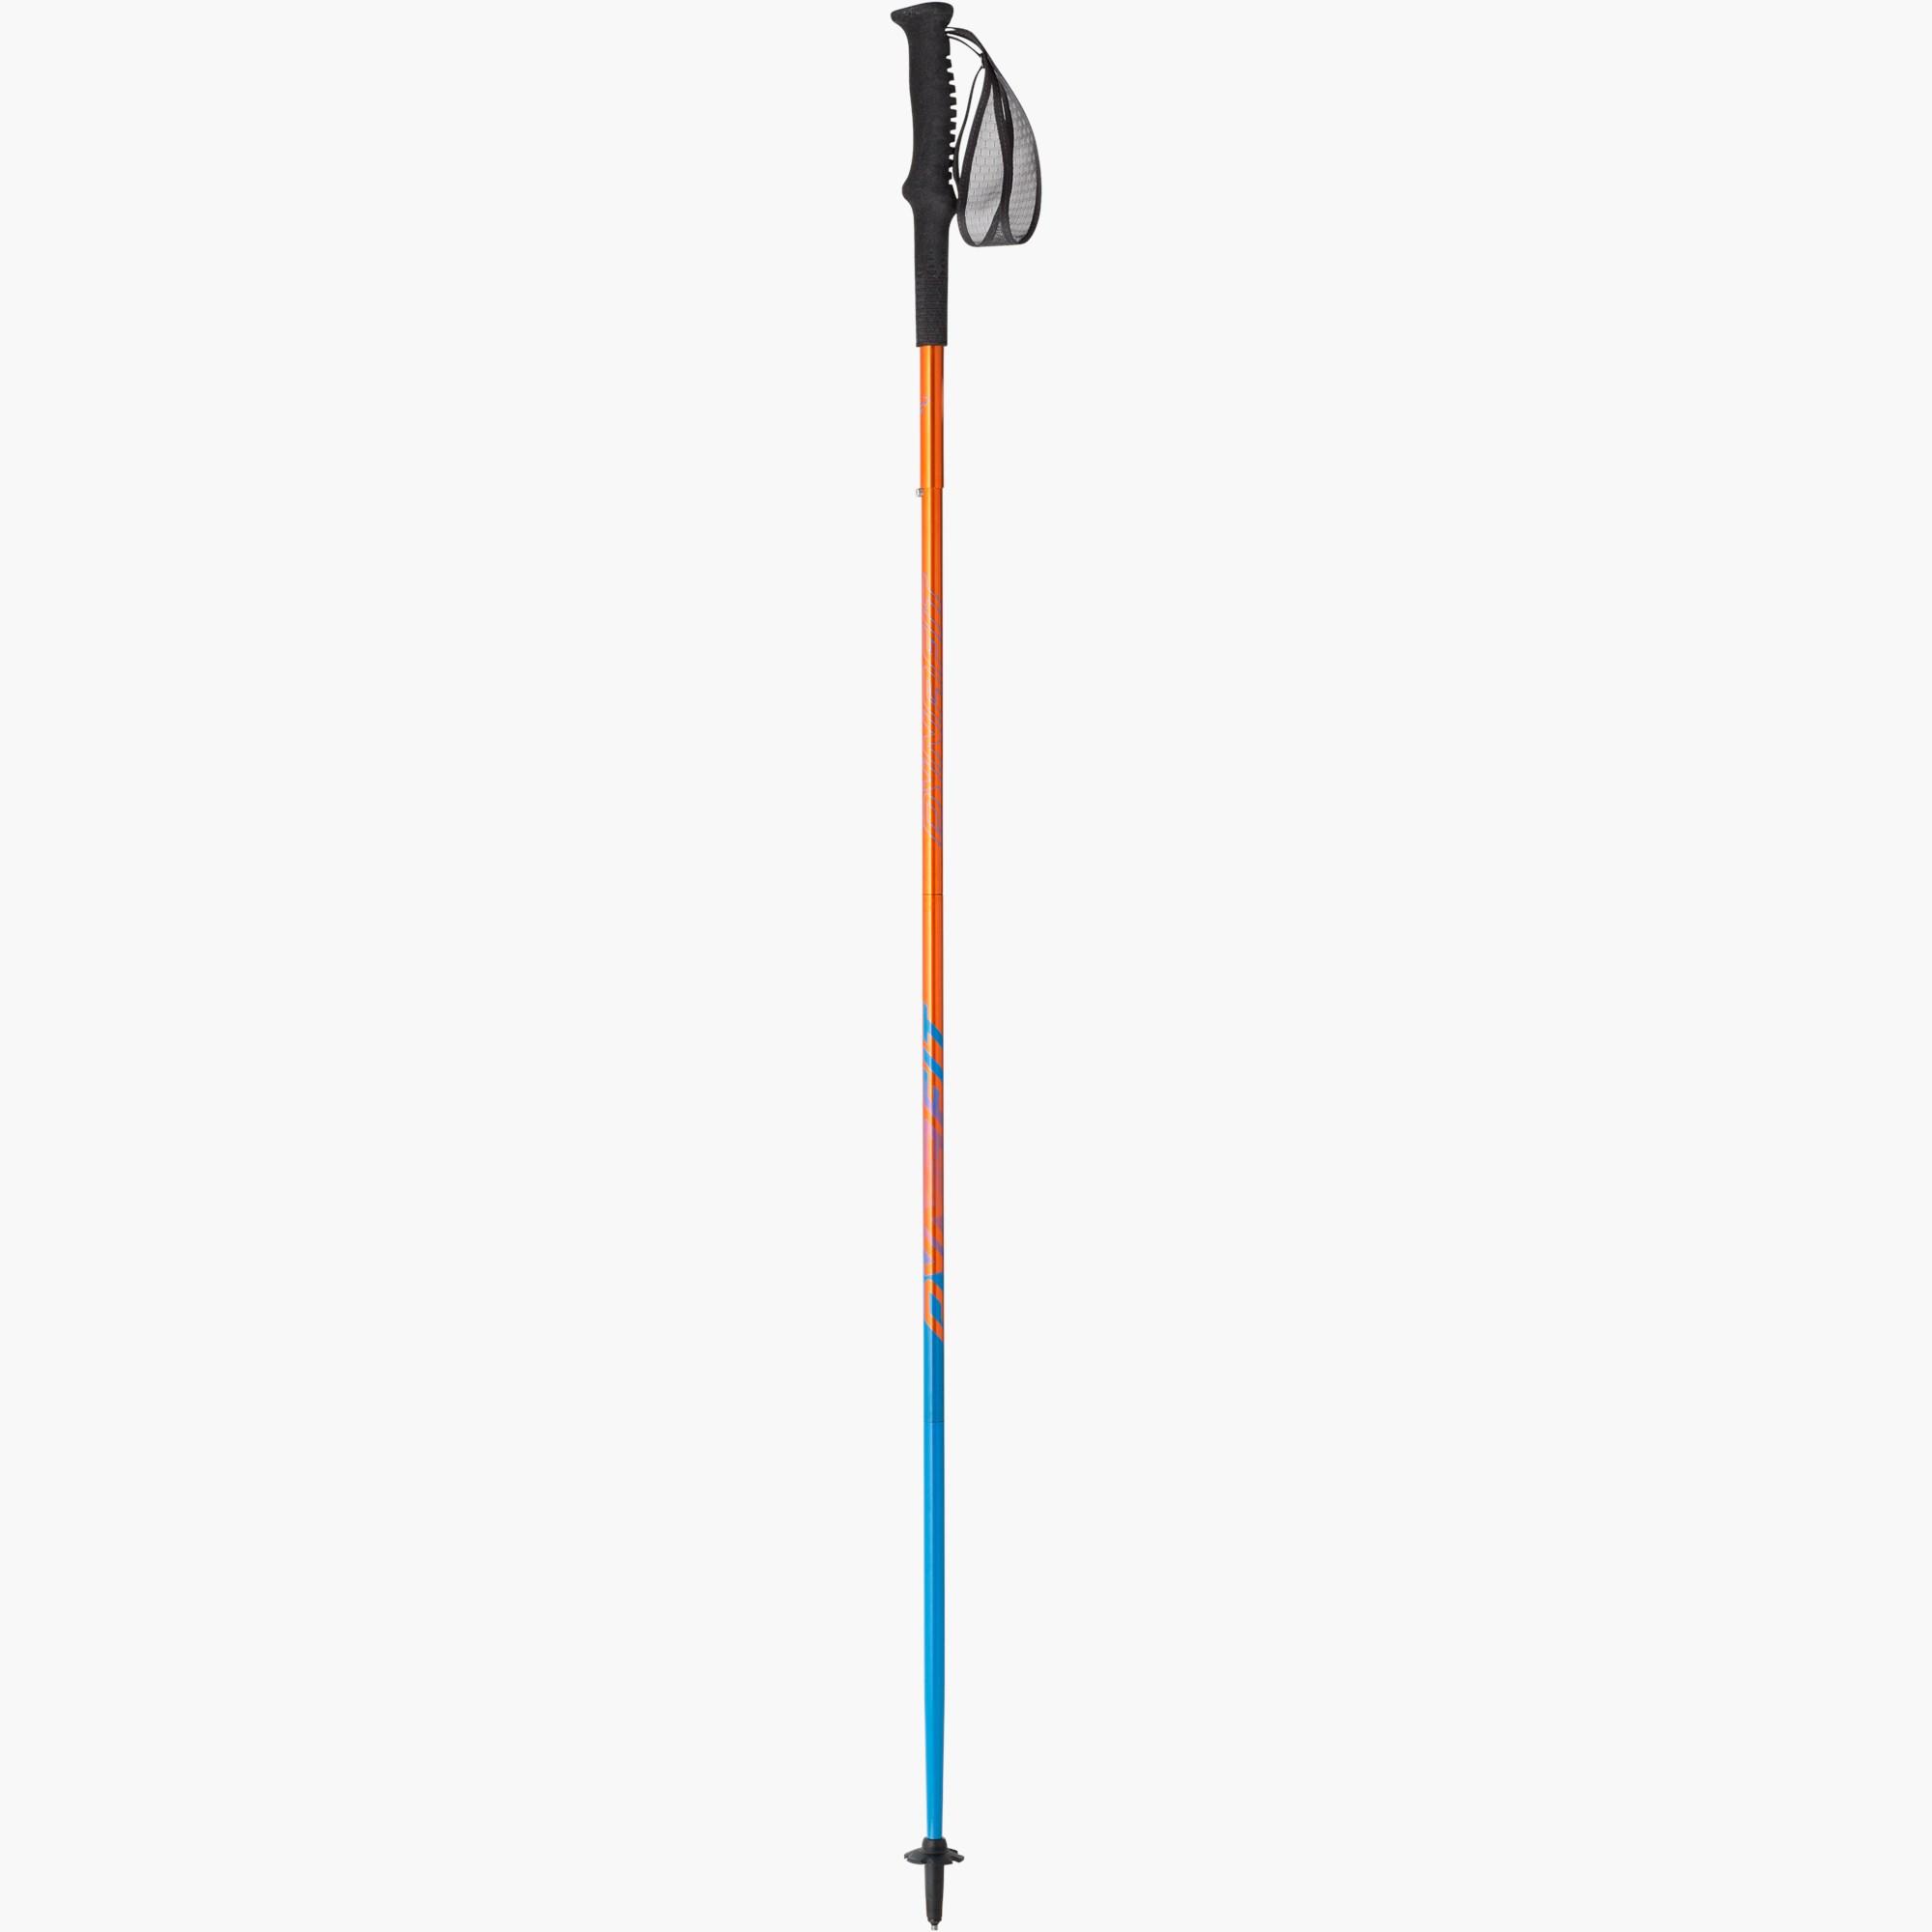 Vertical Pole